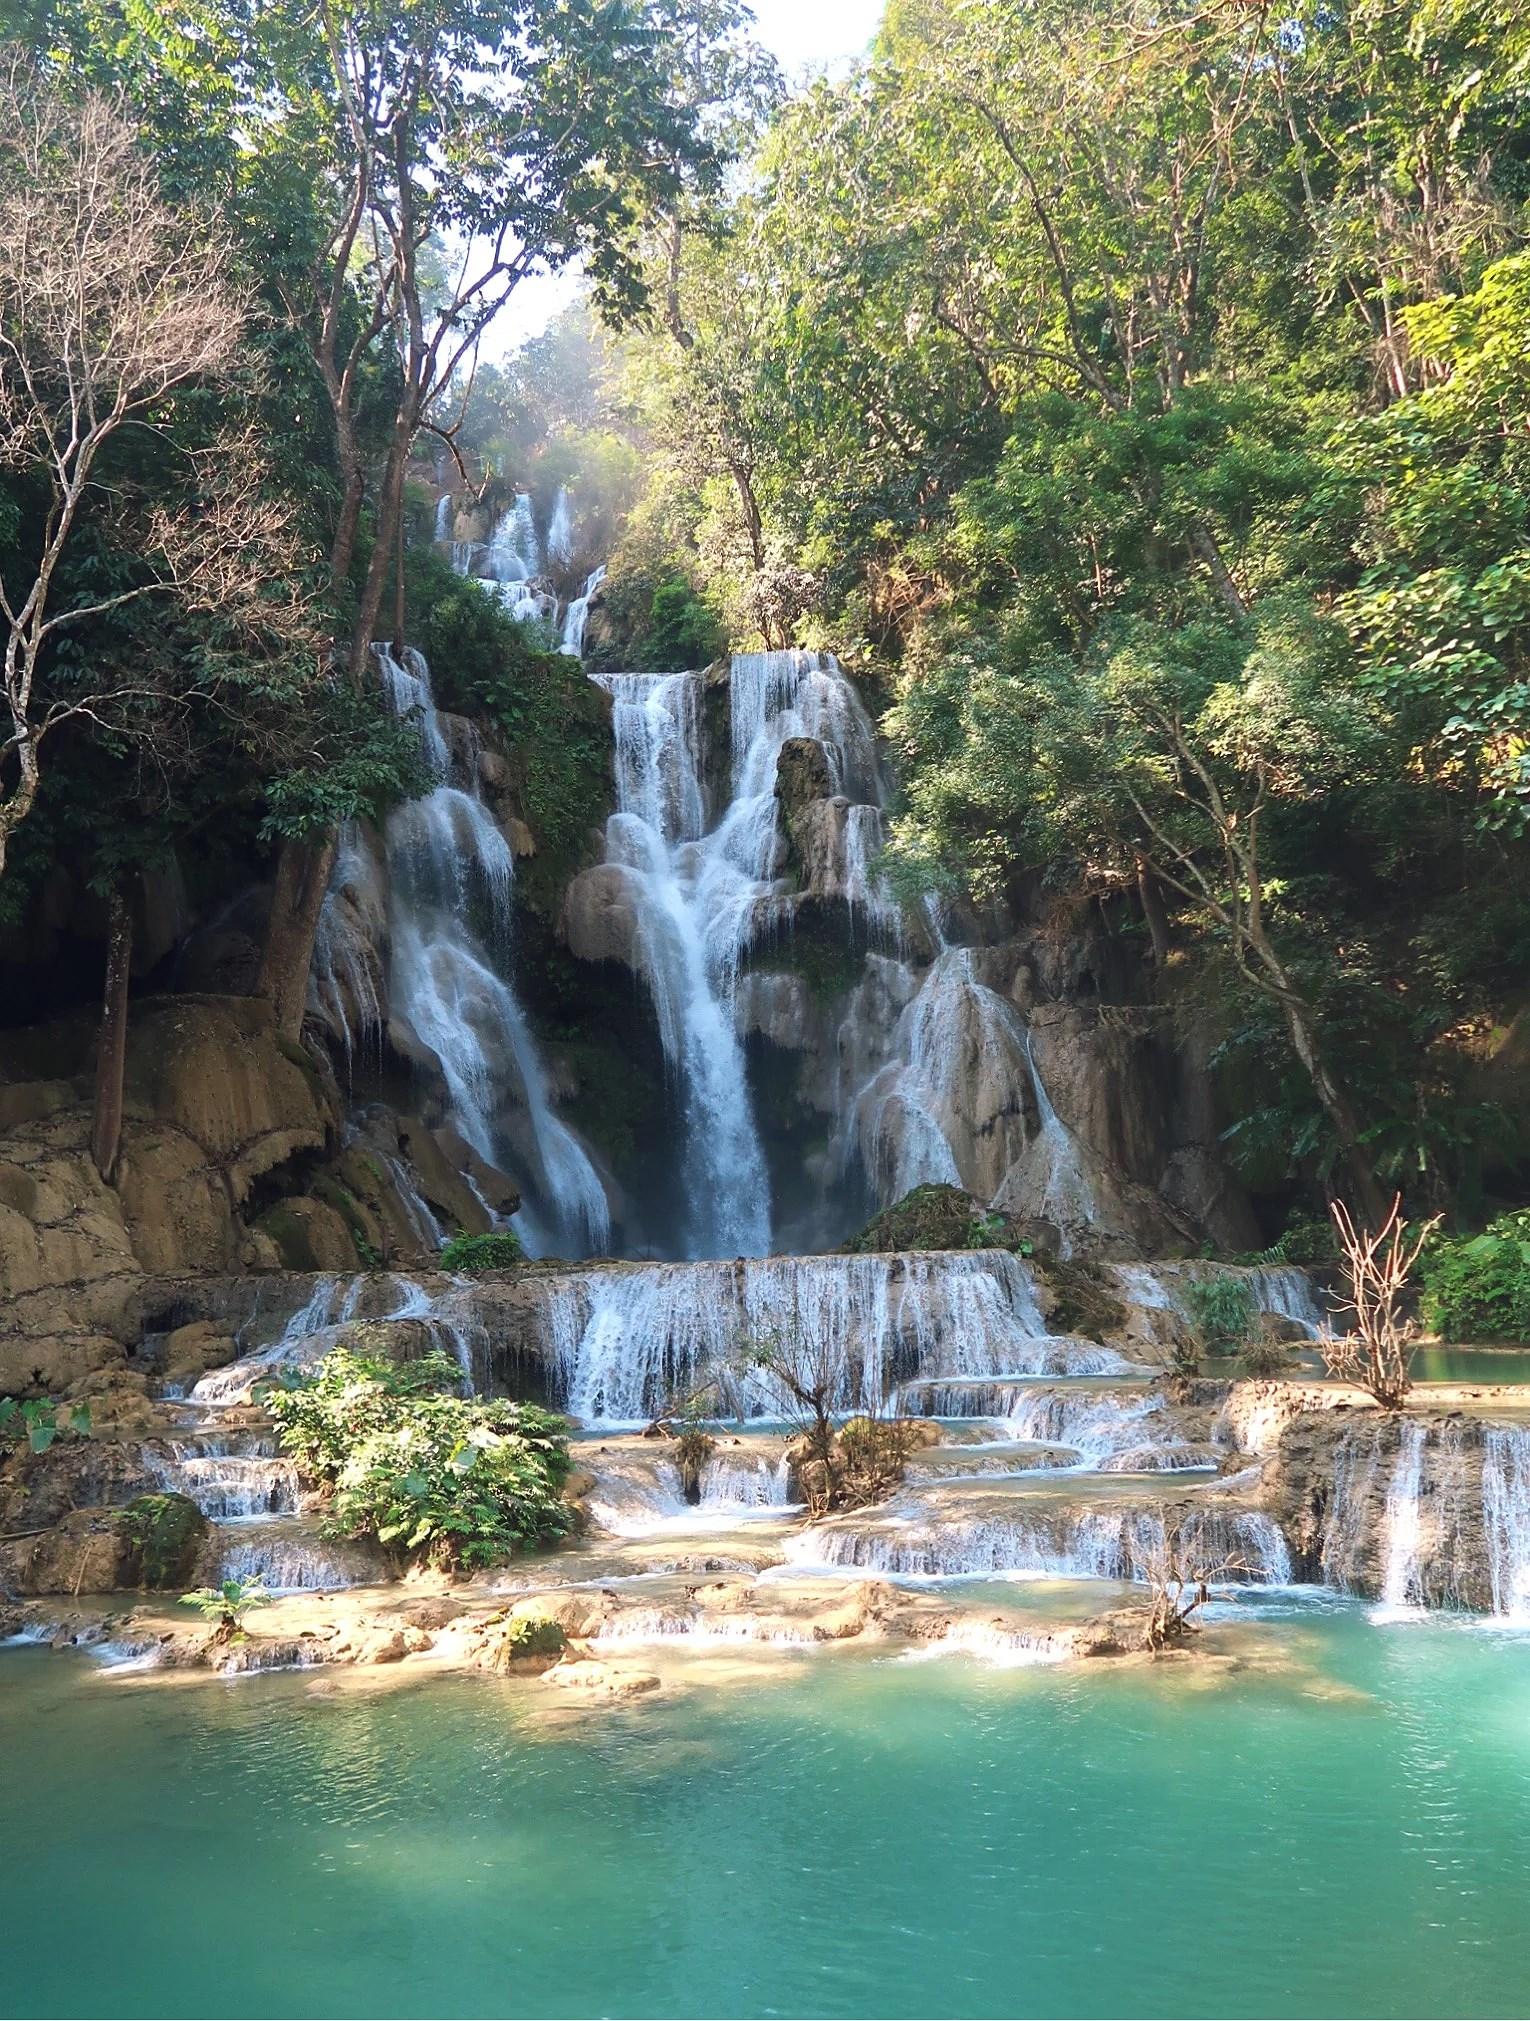 Kuang Si Waterfall - Oslagbart vackert